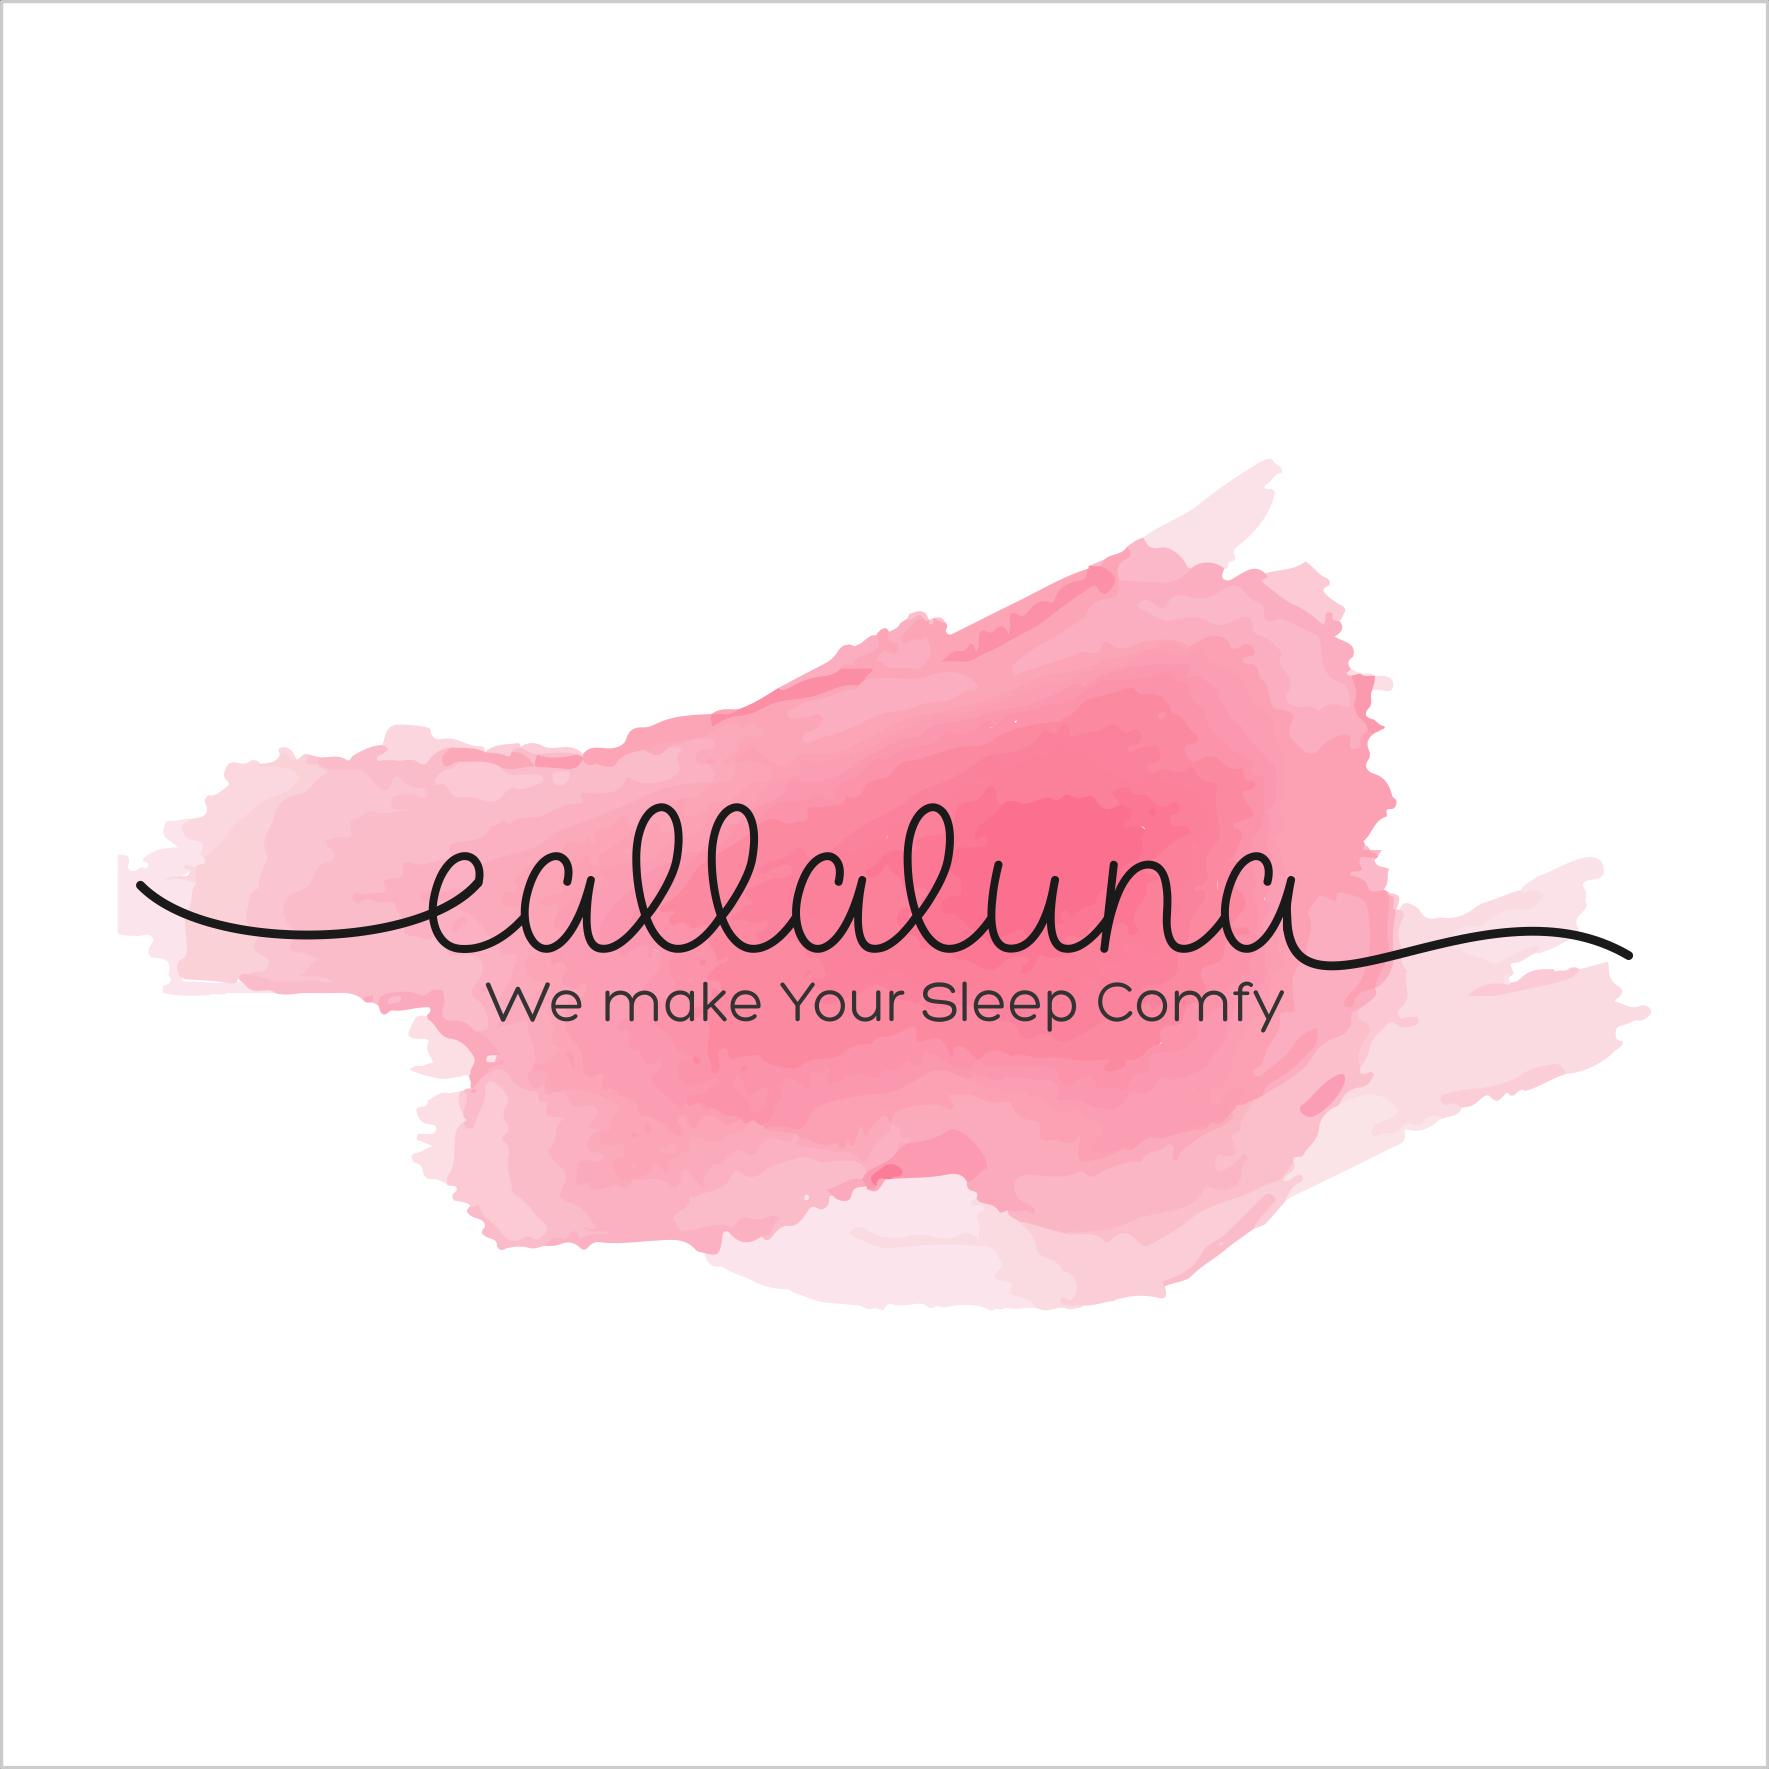 Mycallaluna logo